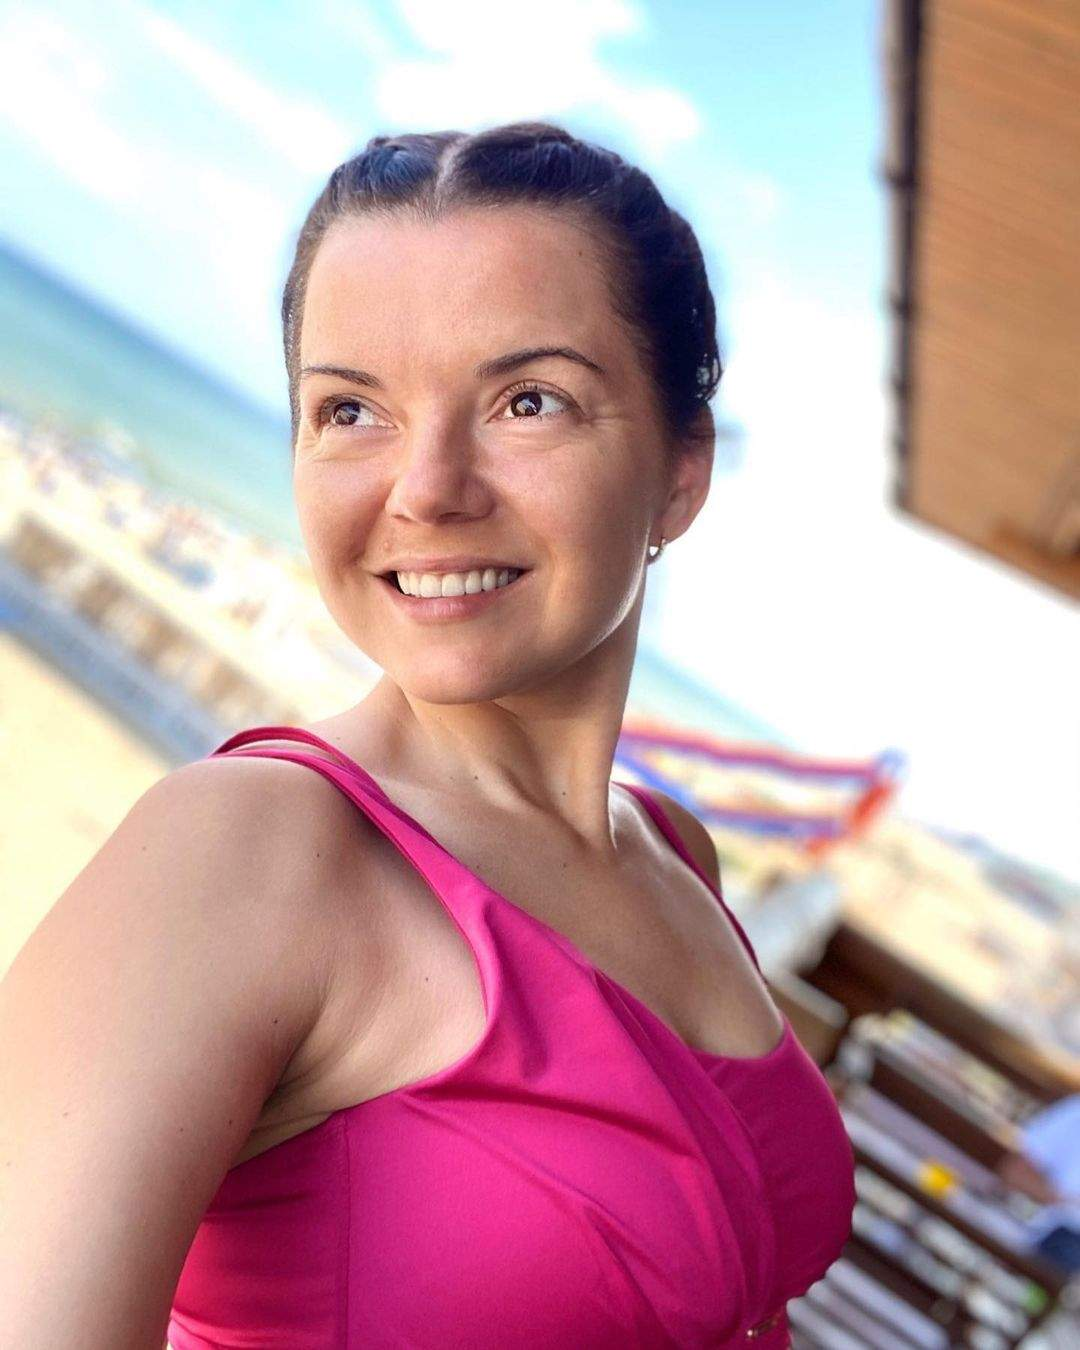 Марічка Падалко на пляжі в Грибівці